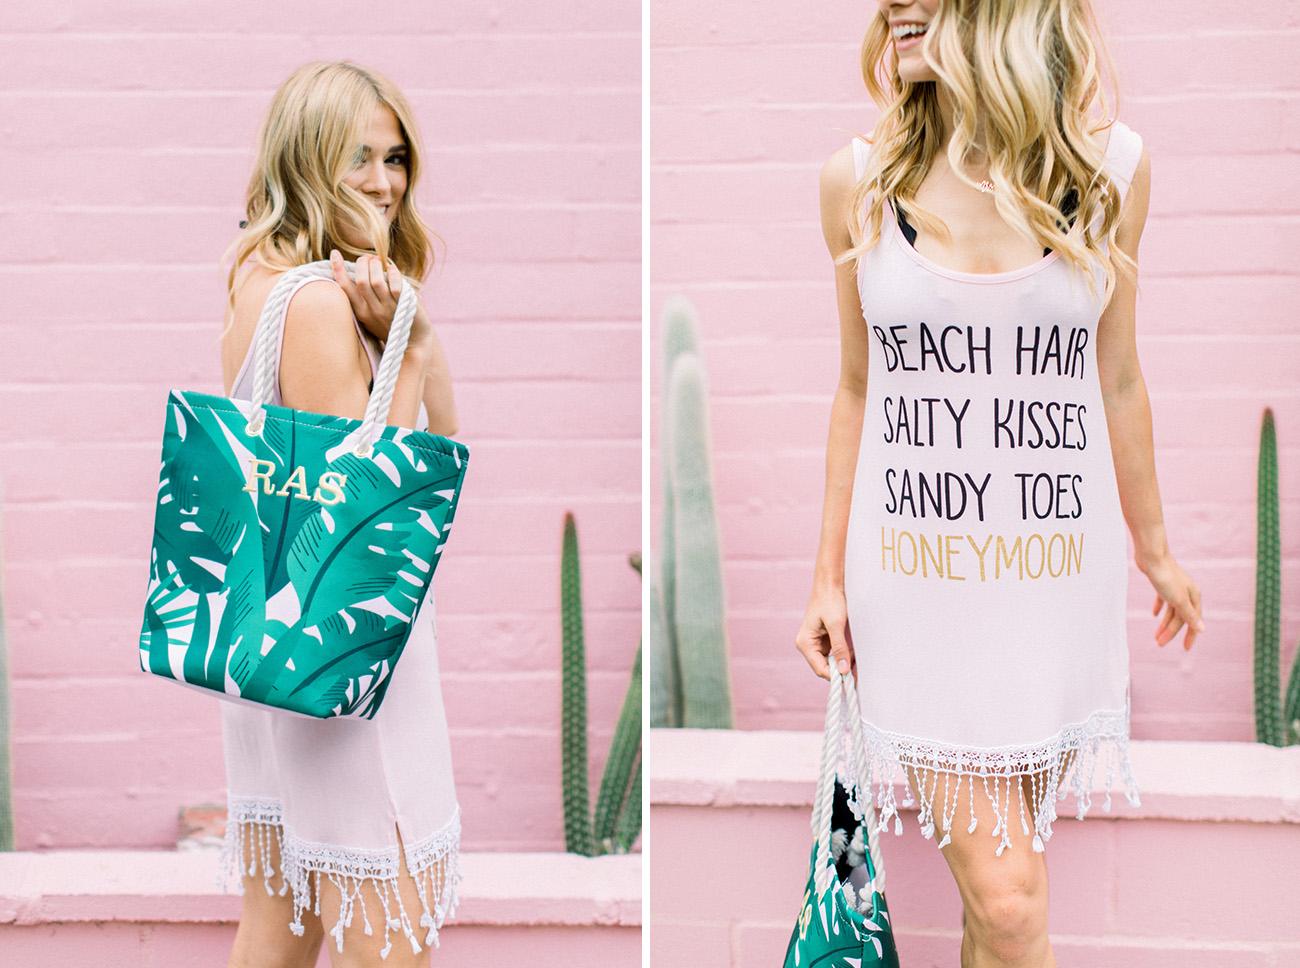 beach hair salty kisses sandy toes honeymoon